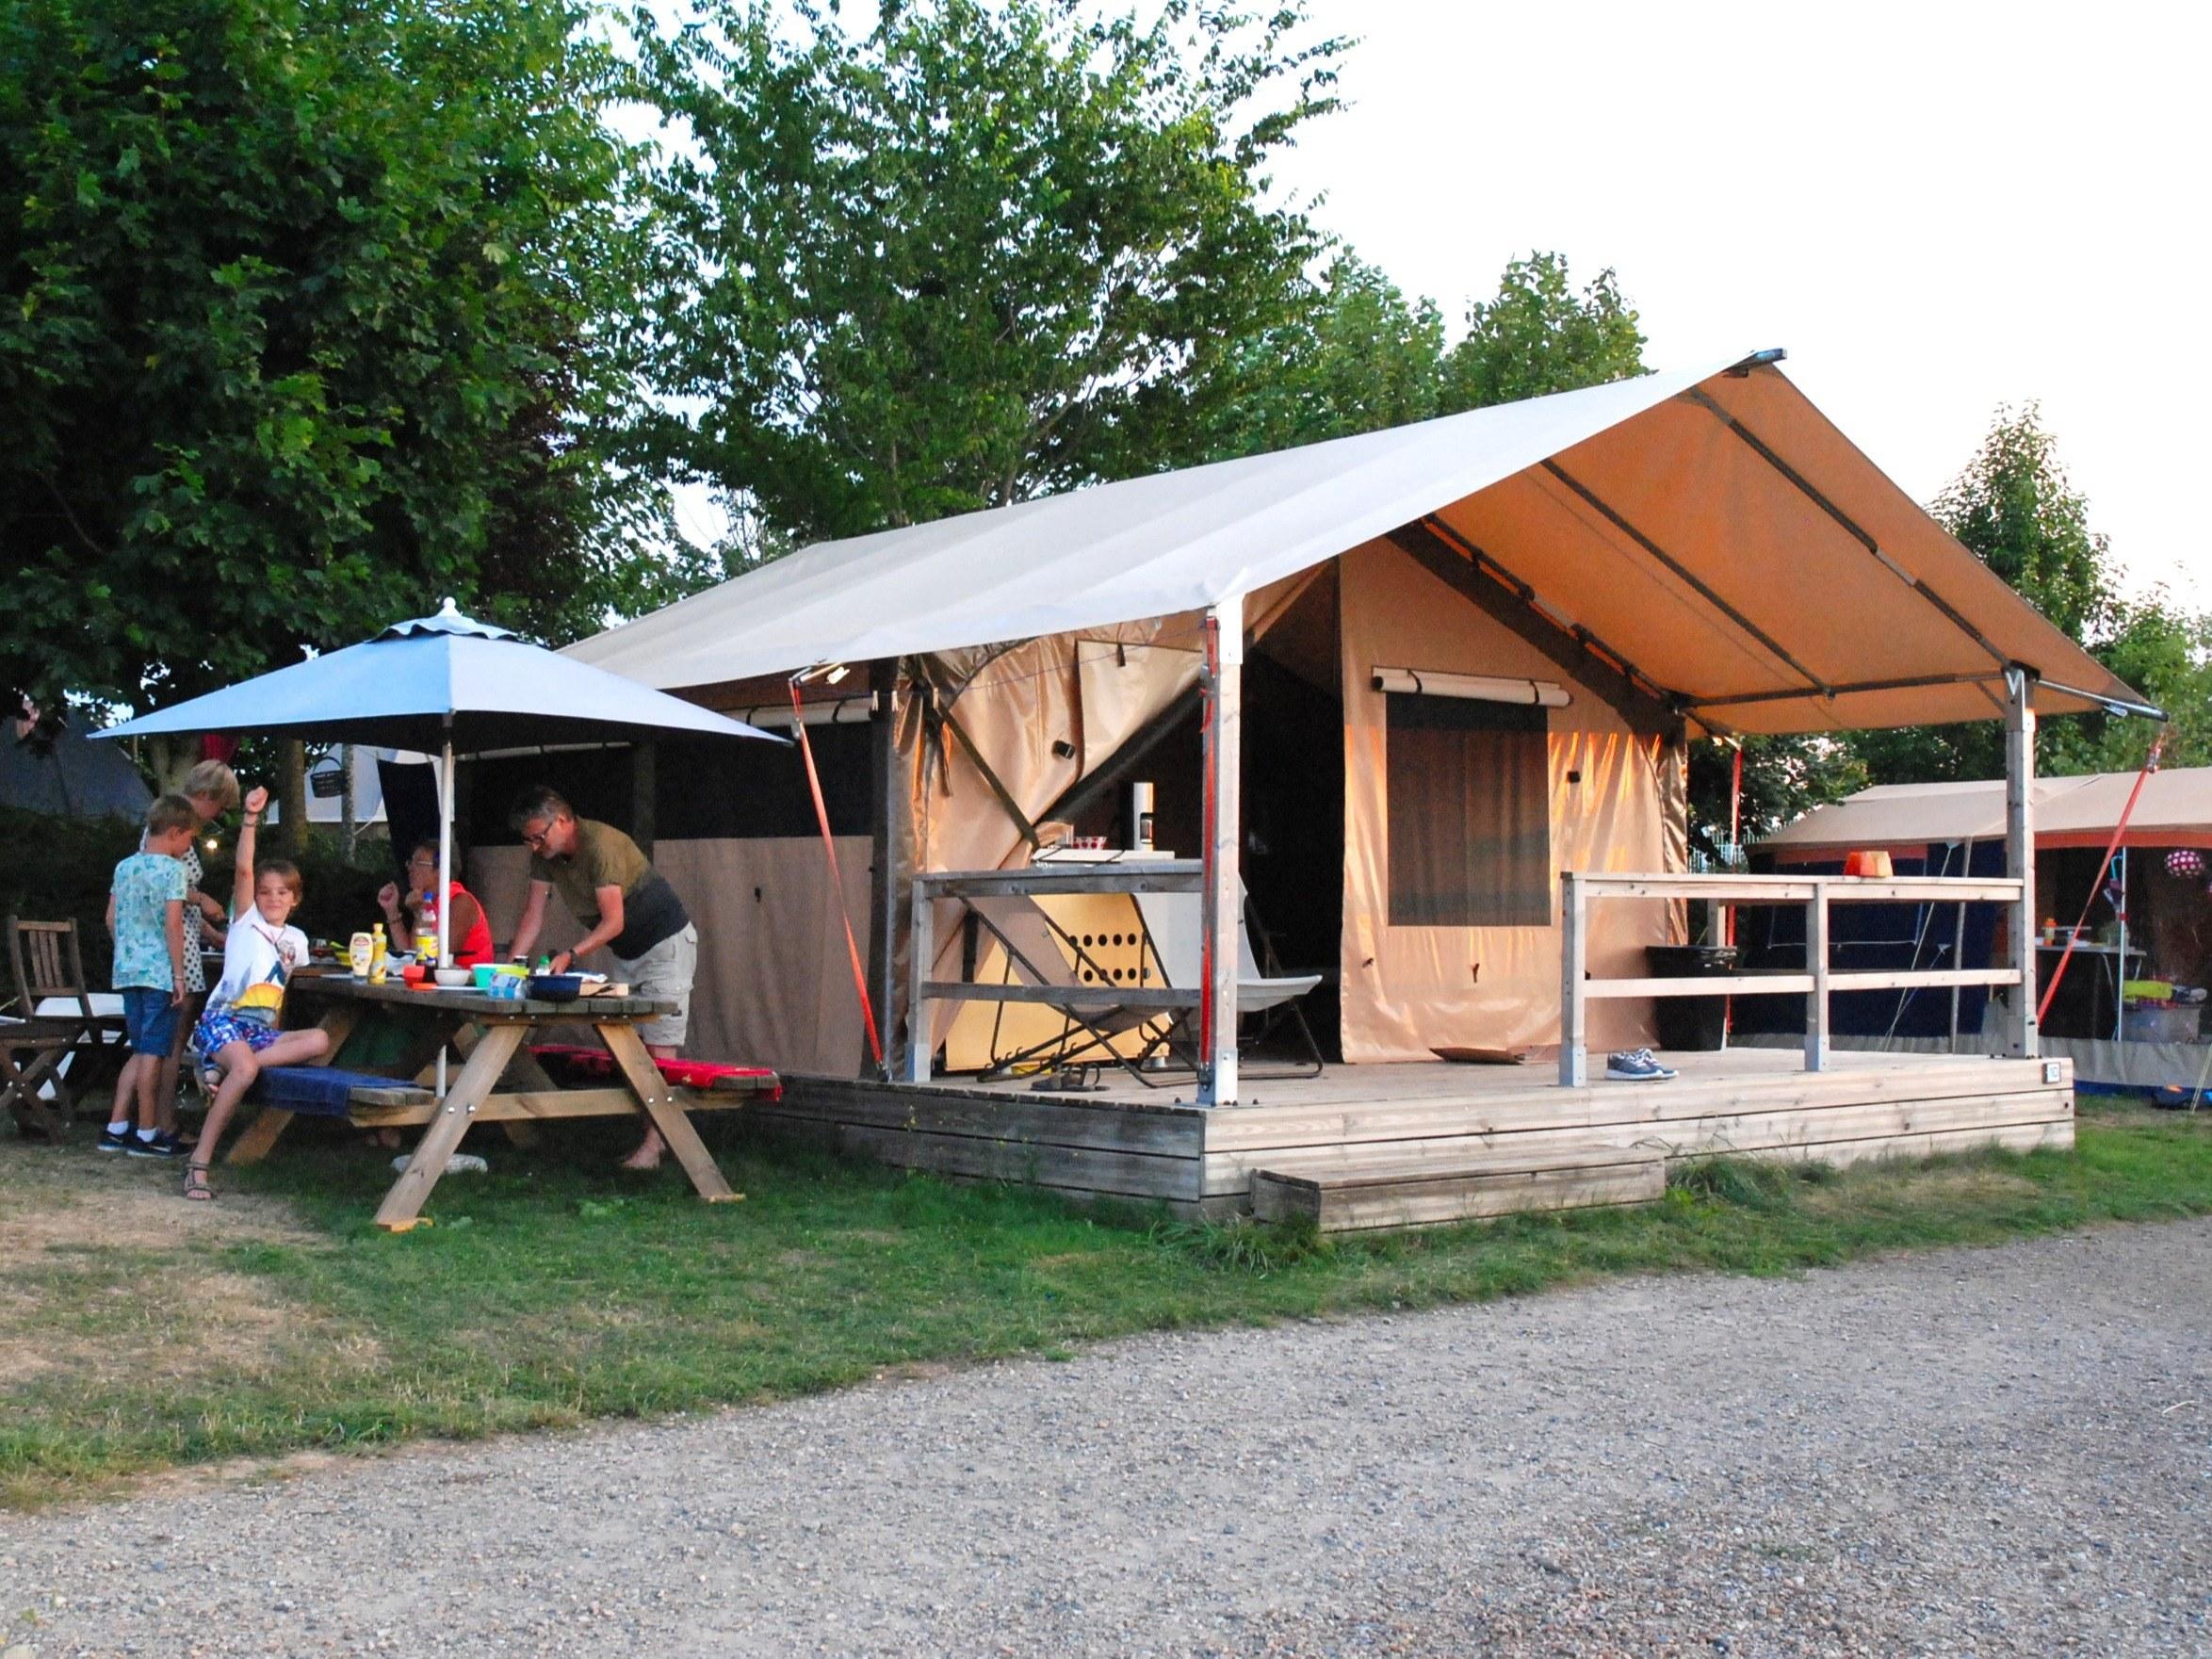 Camping Le Clapas tente lodge Victoria